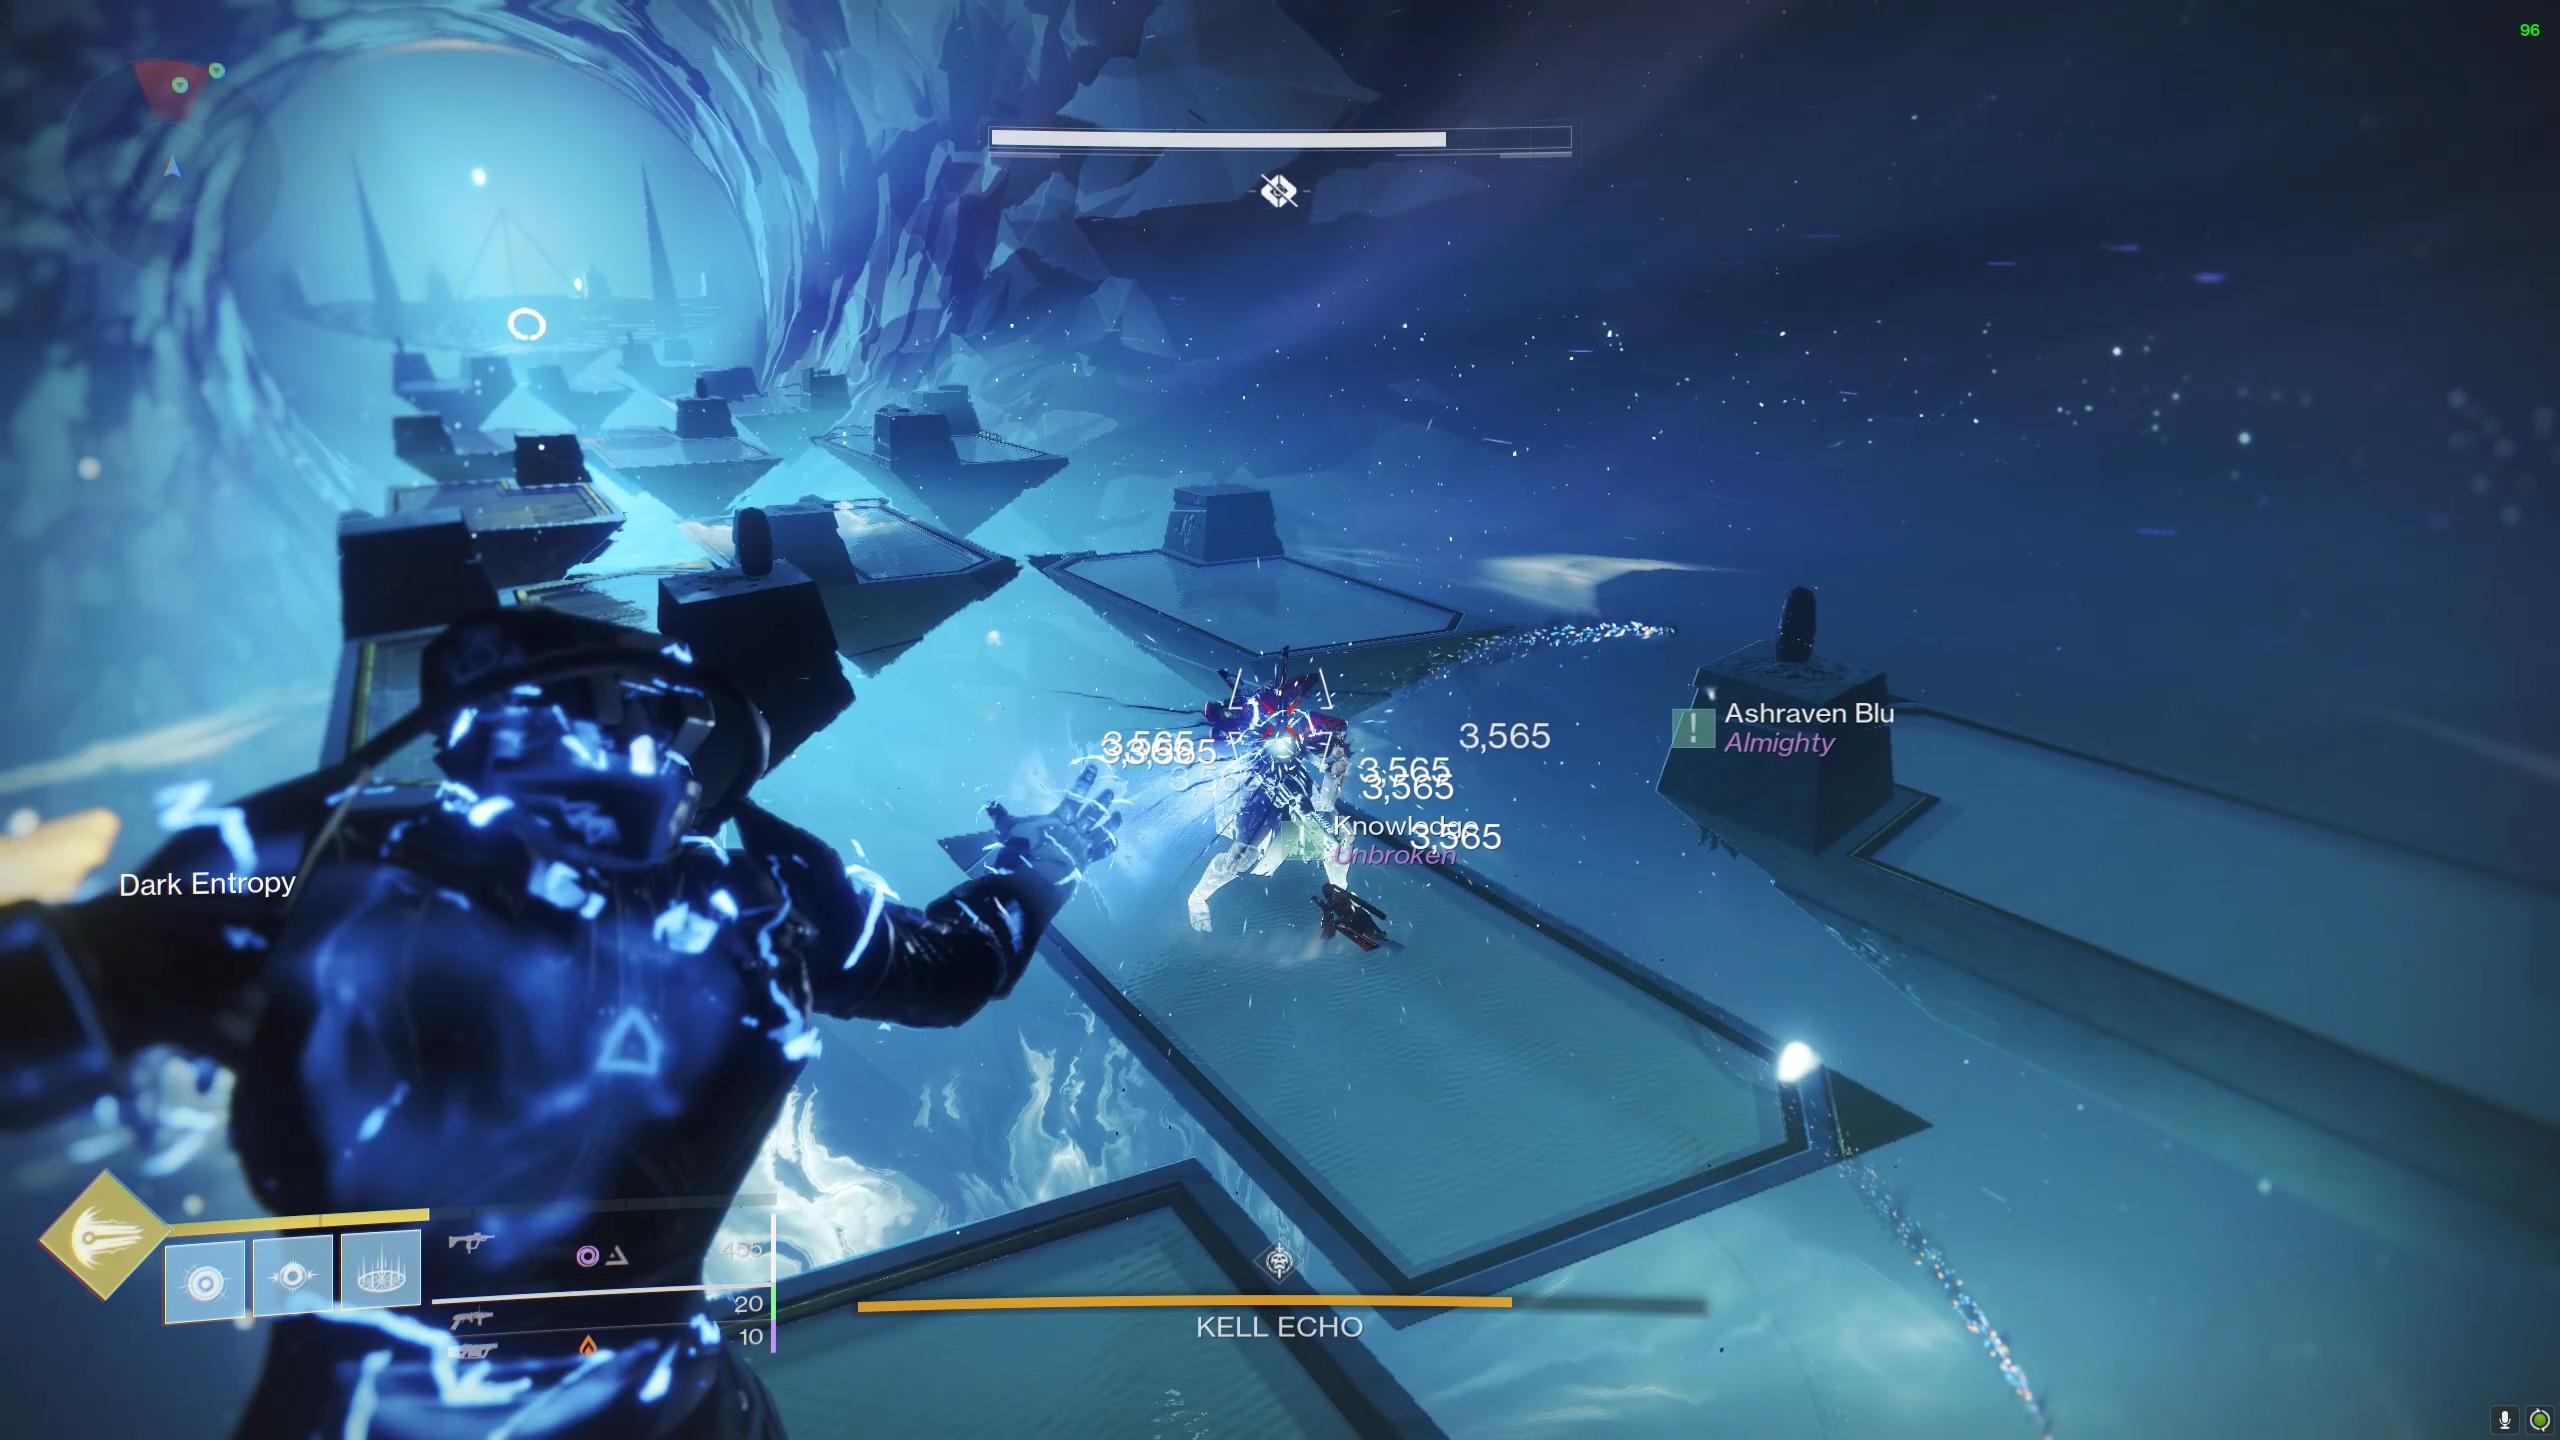 Destiny 2 Prophecy dungeon Kell Echo hallway